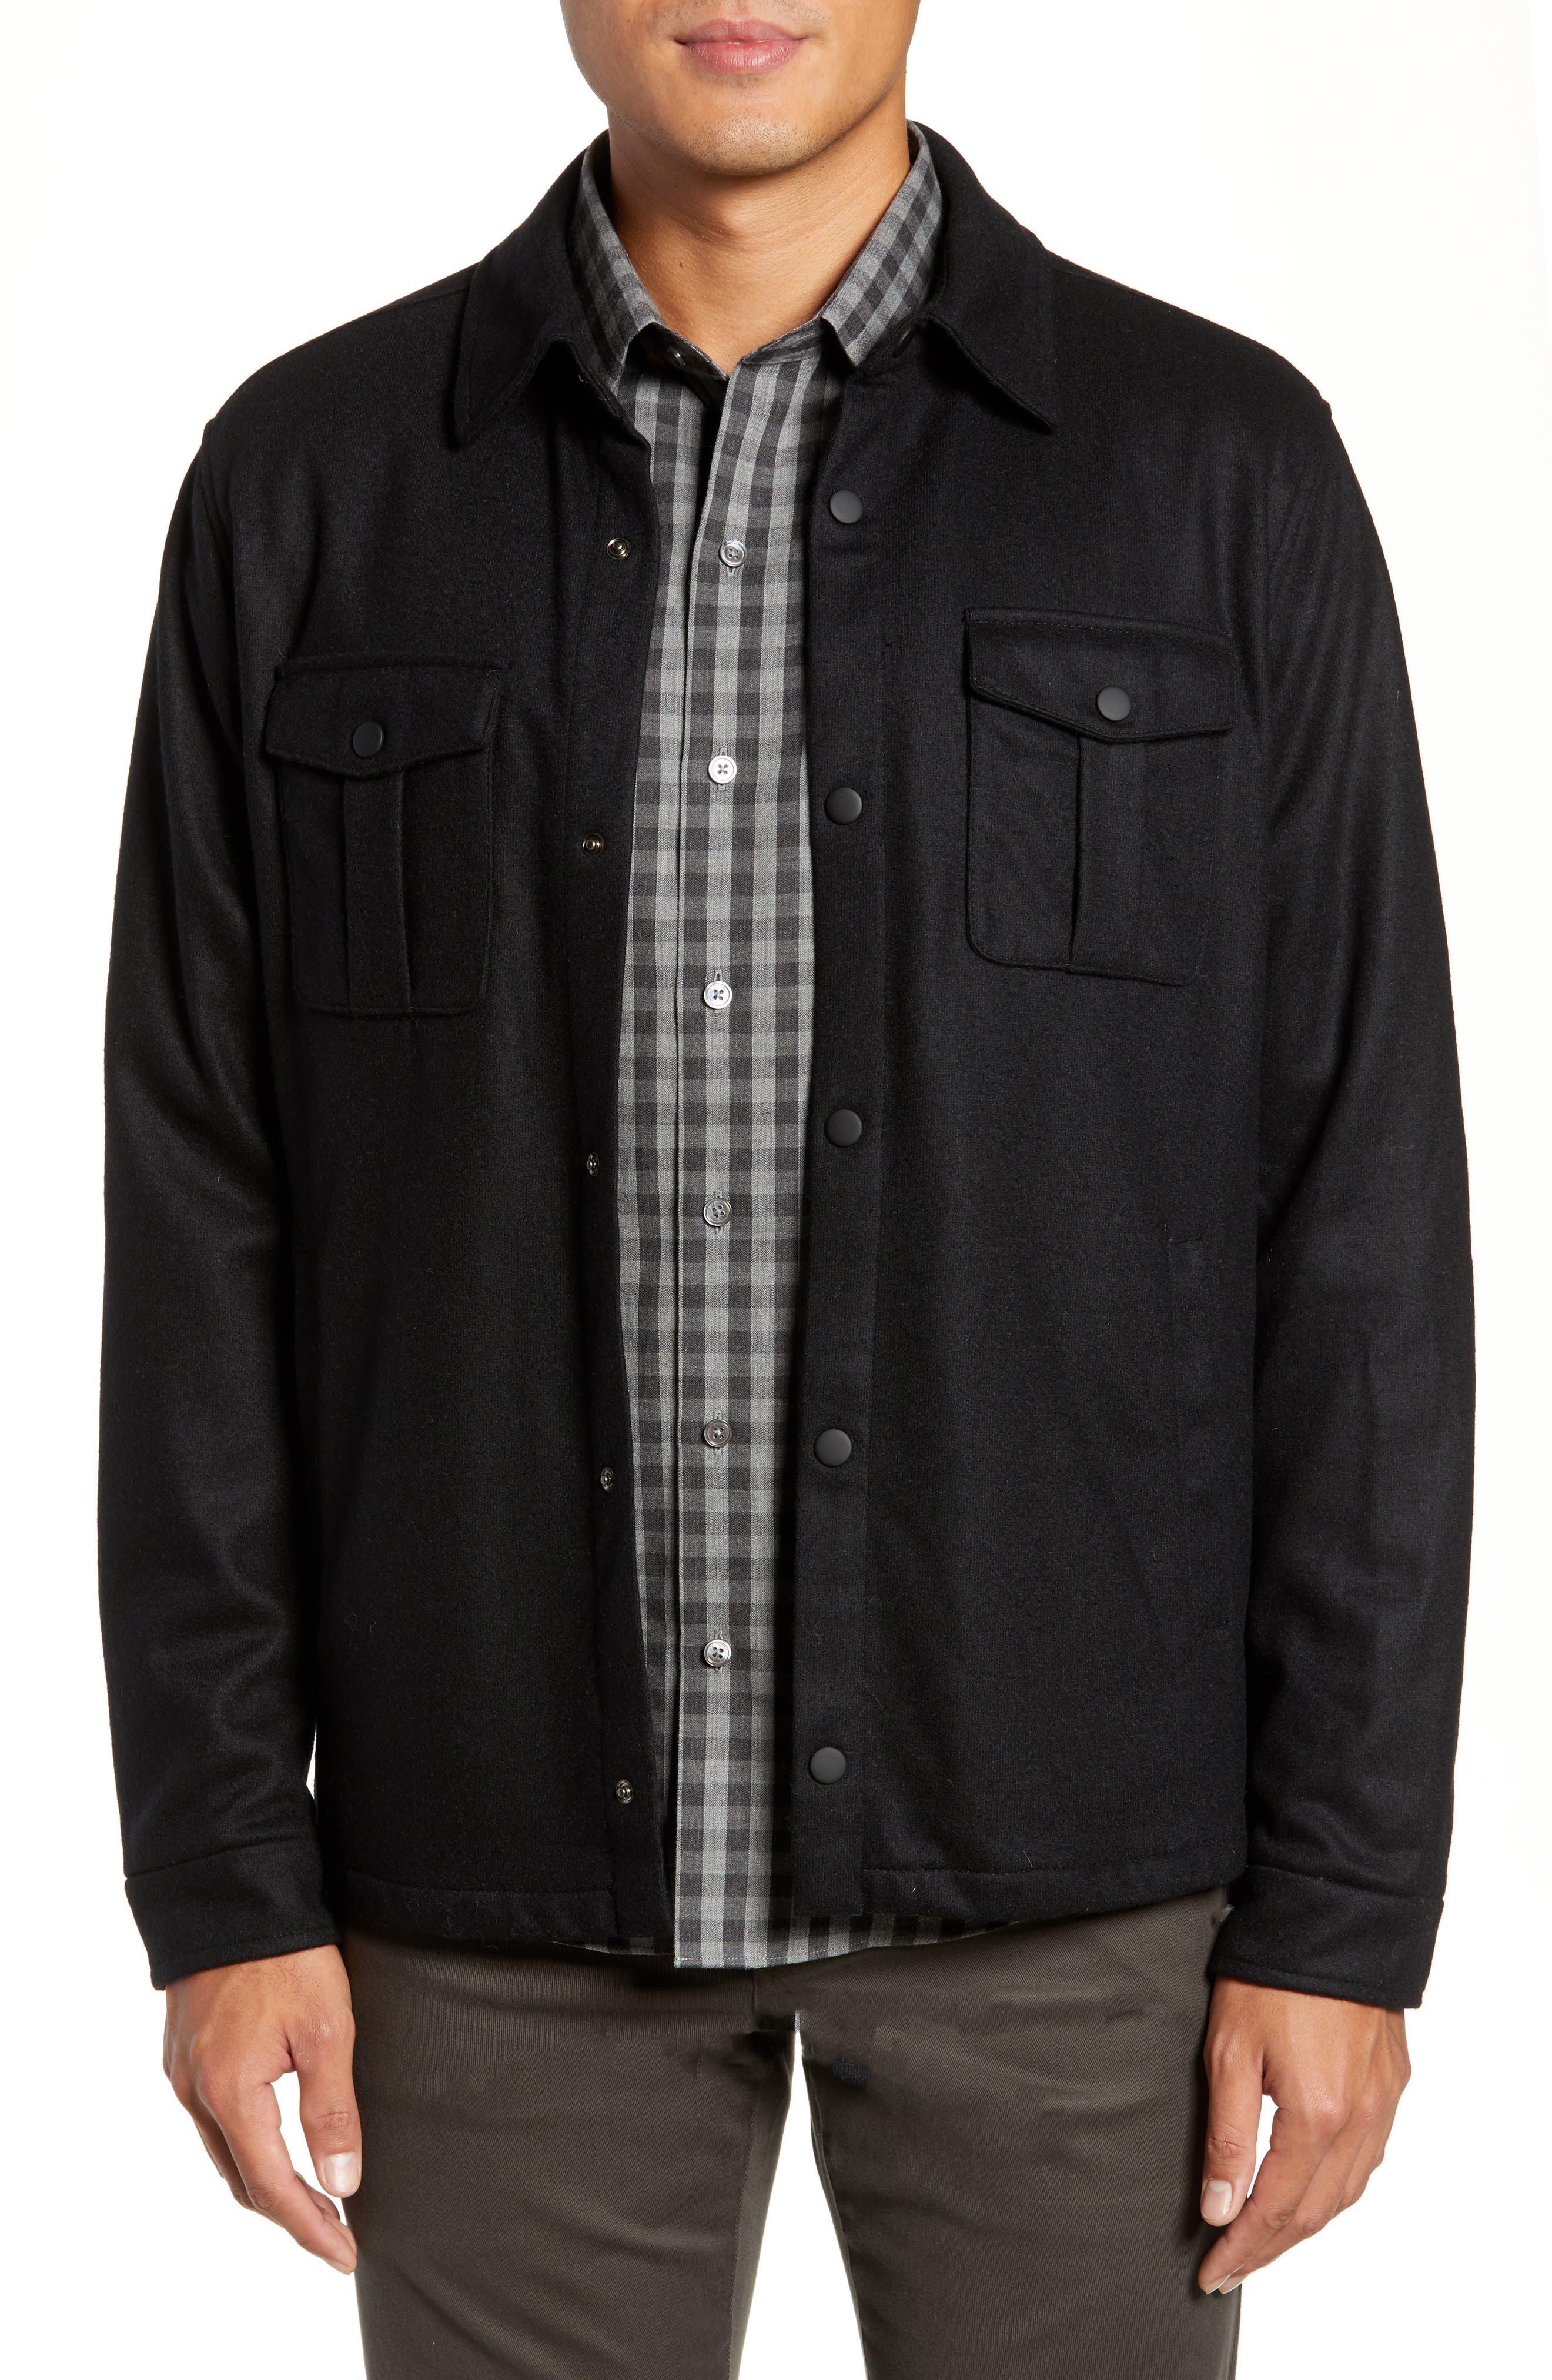 ZACHARY PRELL Seymour Regular Fit Wool Blend Shirt Jacket in Black